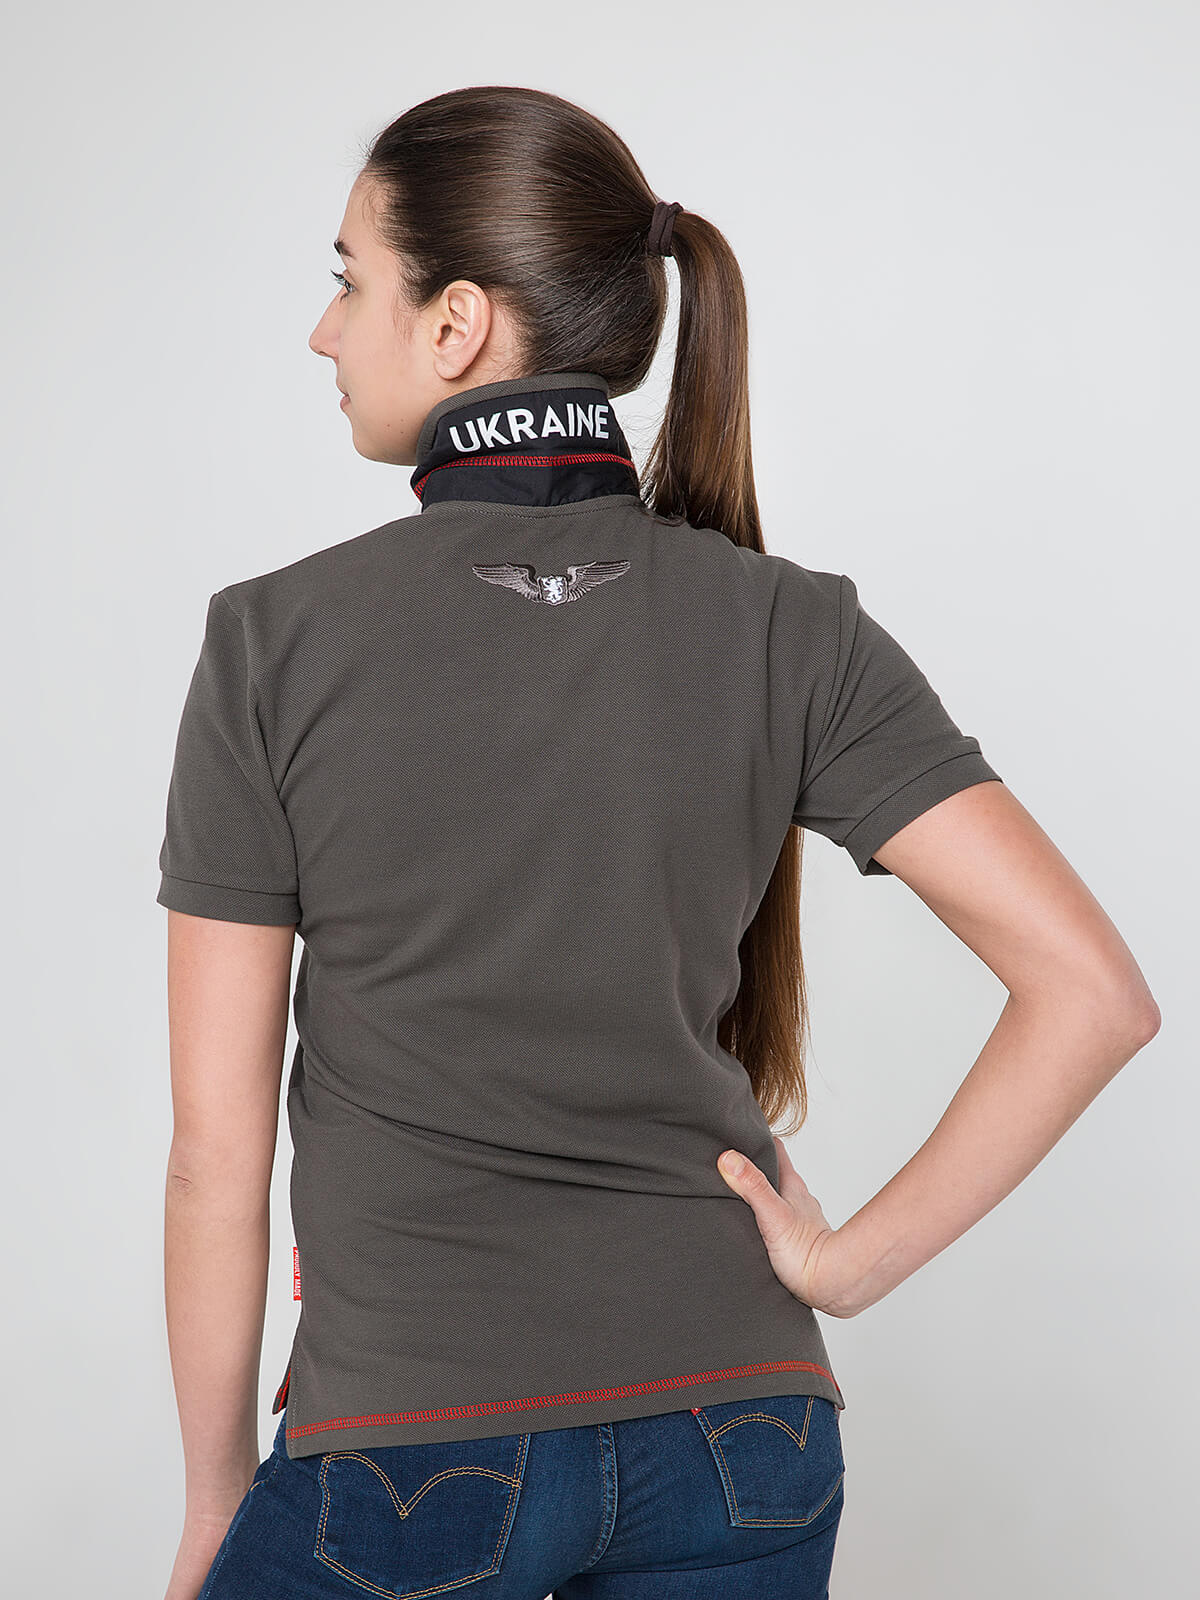 Women's Polo Shirt Wings. Color khaki brown.  Pique fabric: 100% cotton.